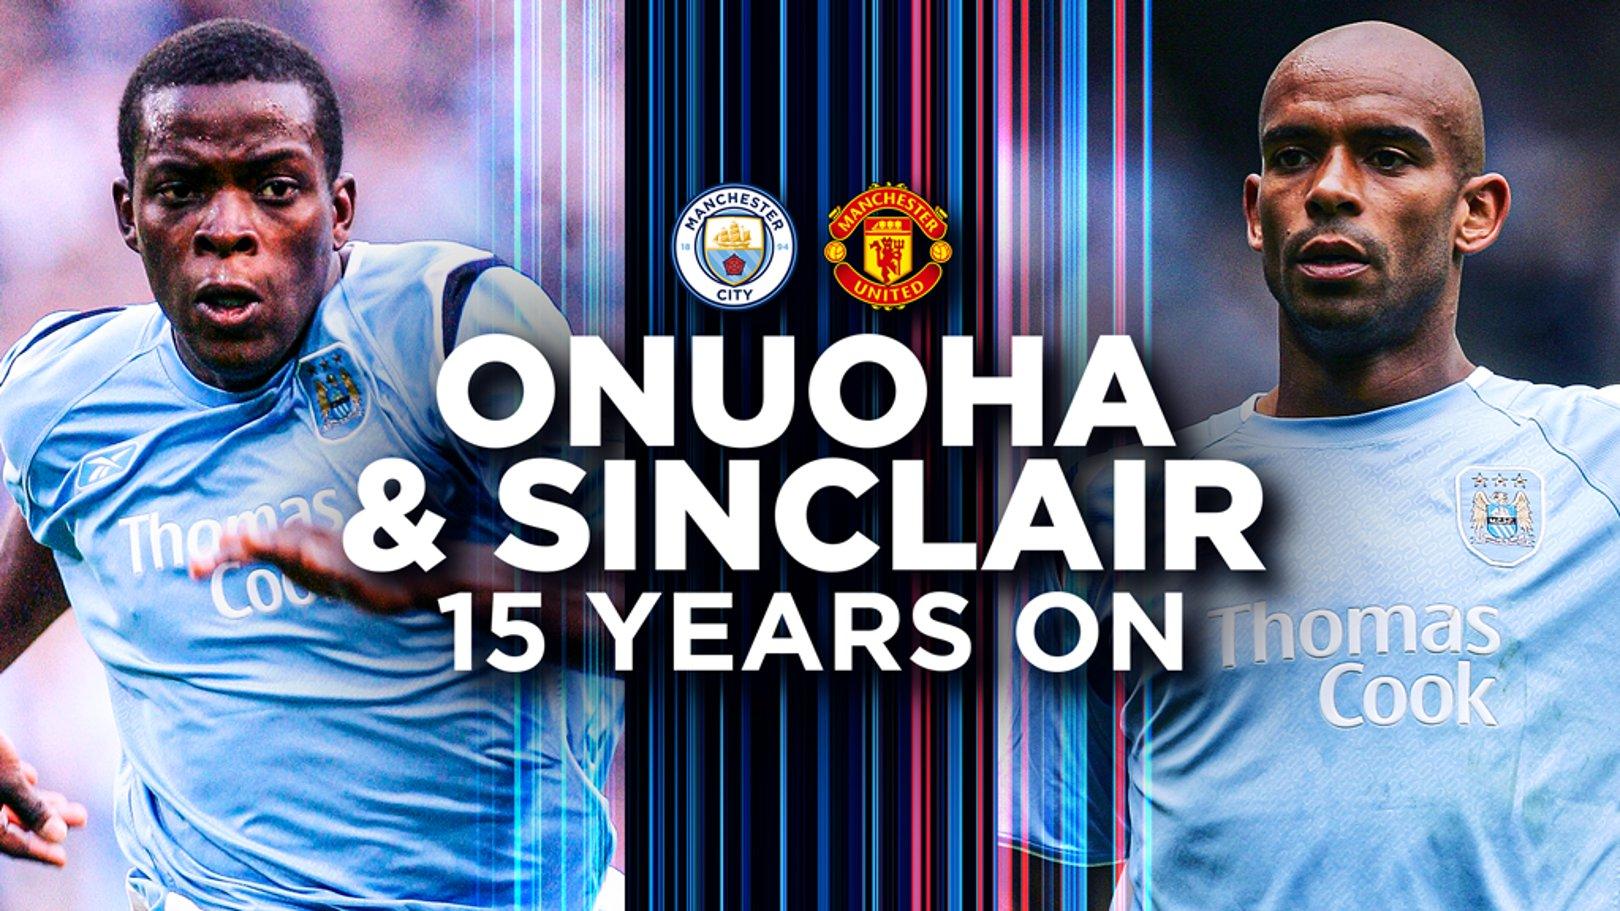 Nedum Onuoha and Trevor Sinclair: When derby dreams come true